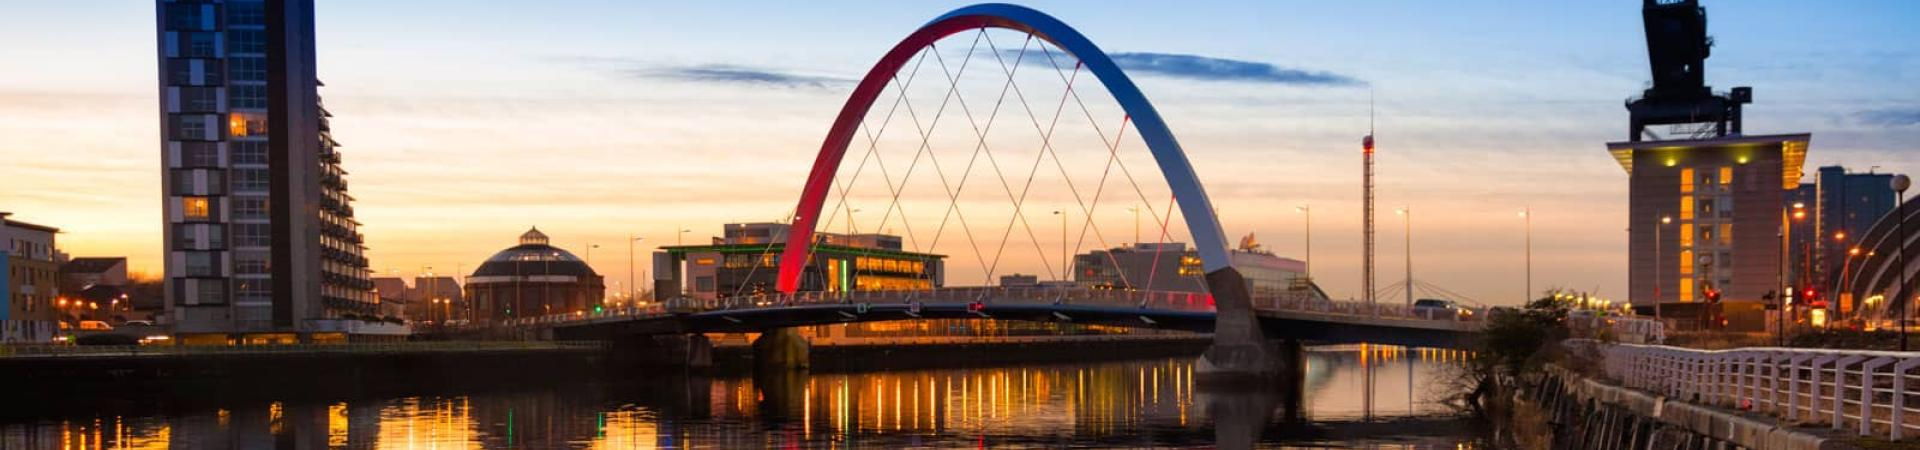 A landscape image of a bridge in Glasgow